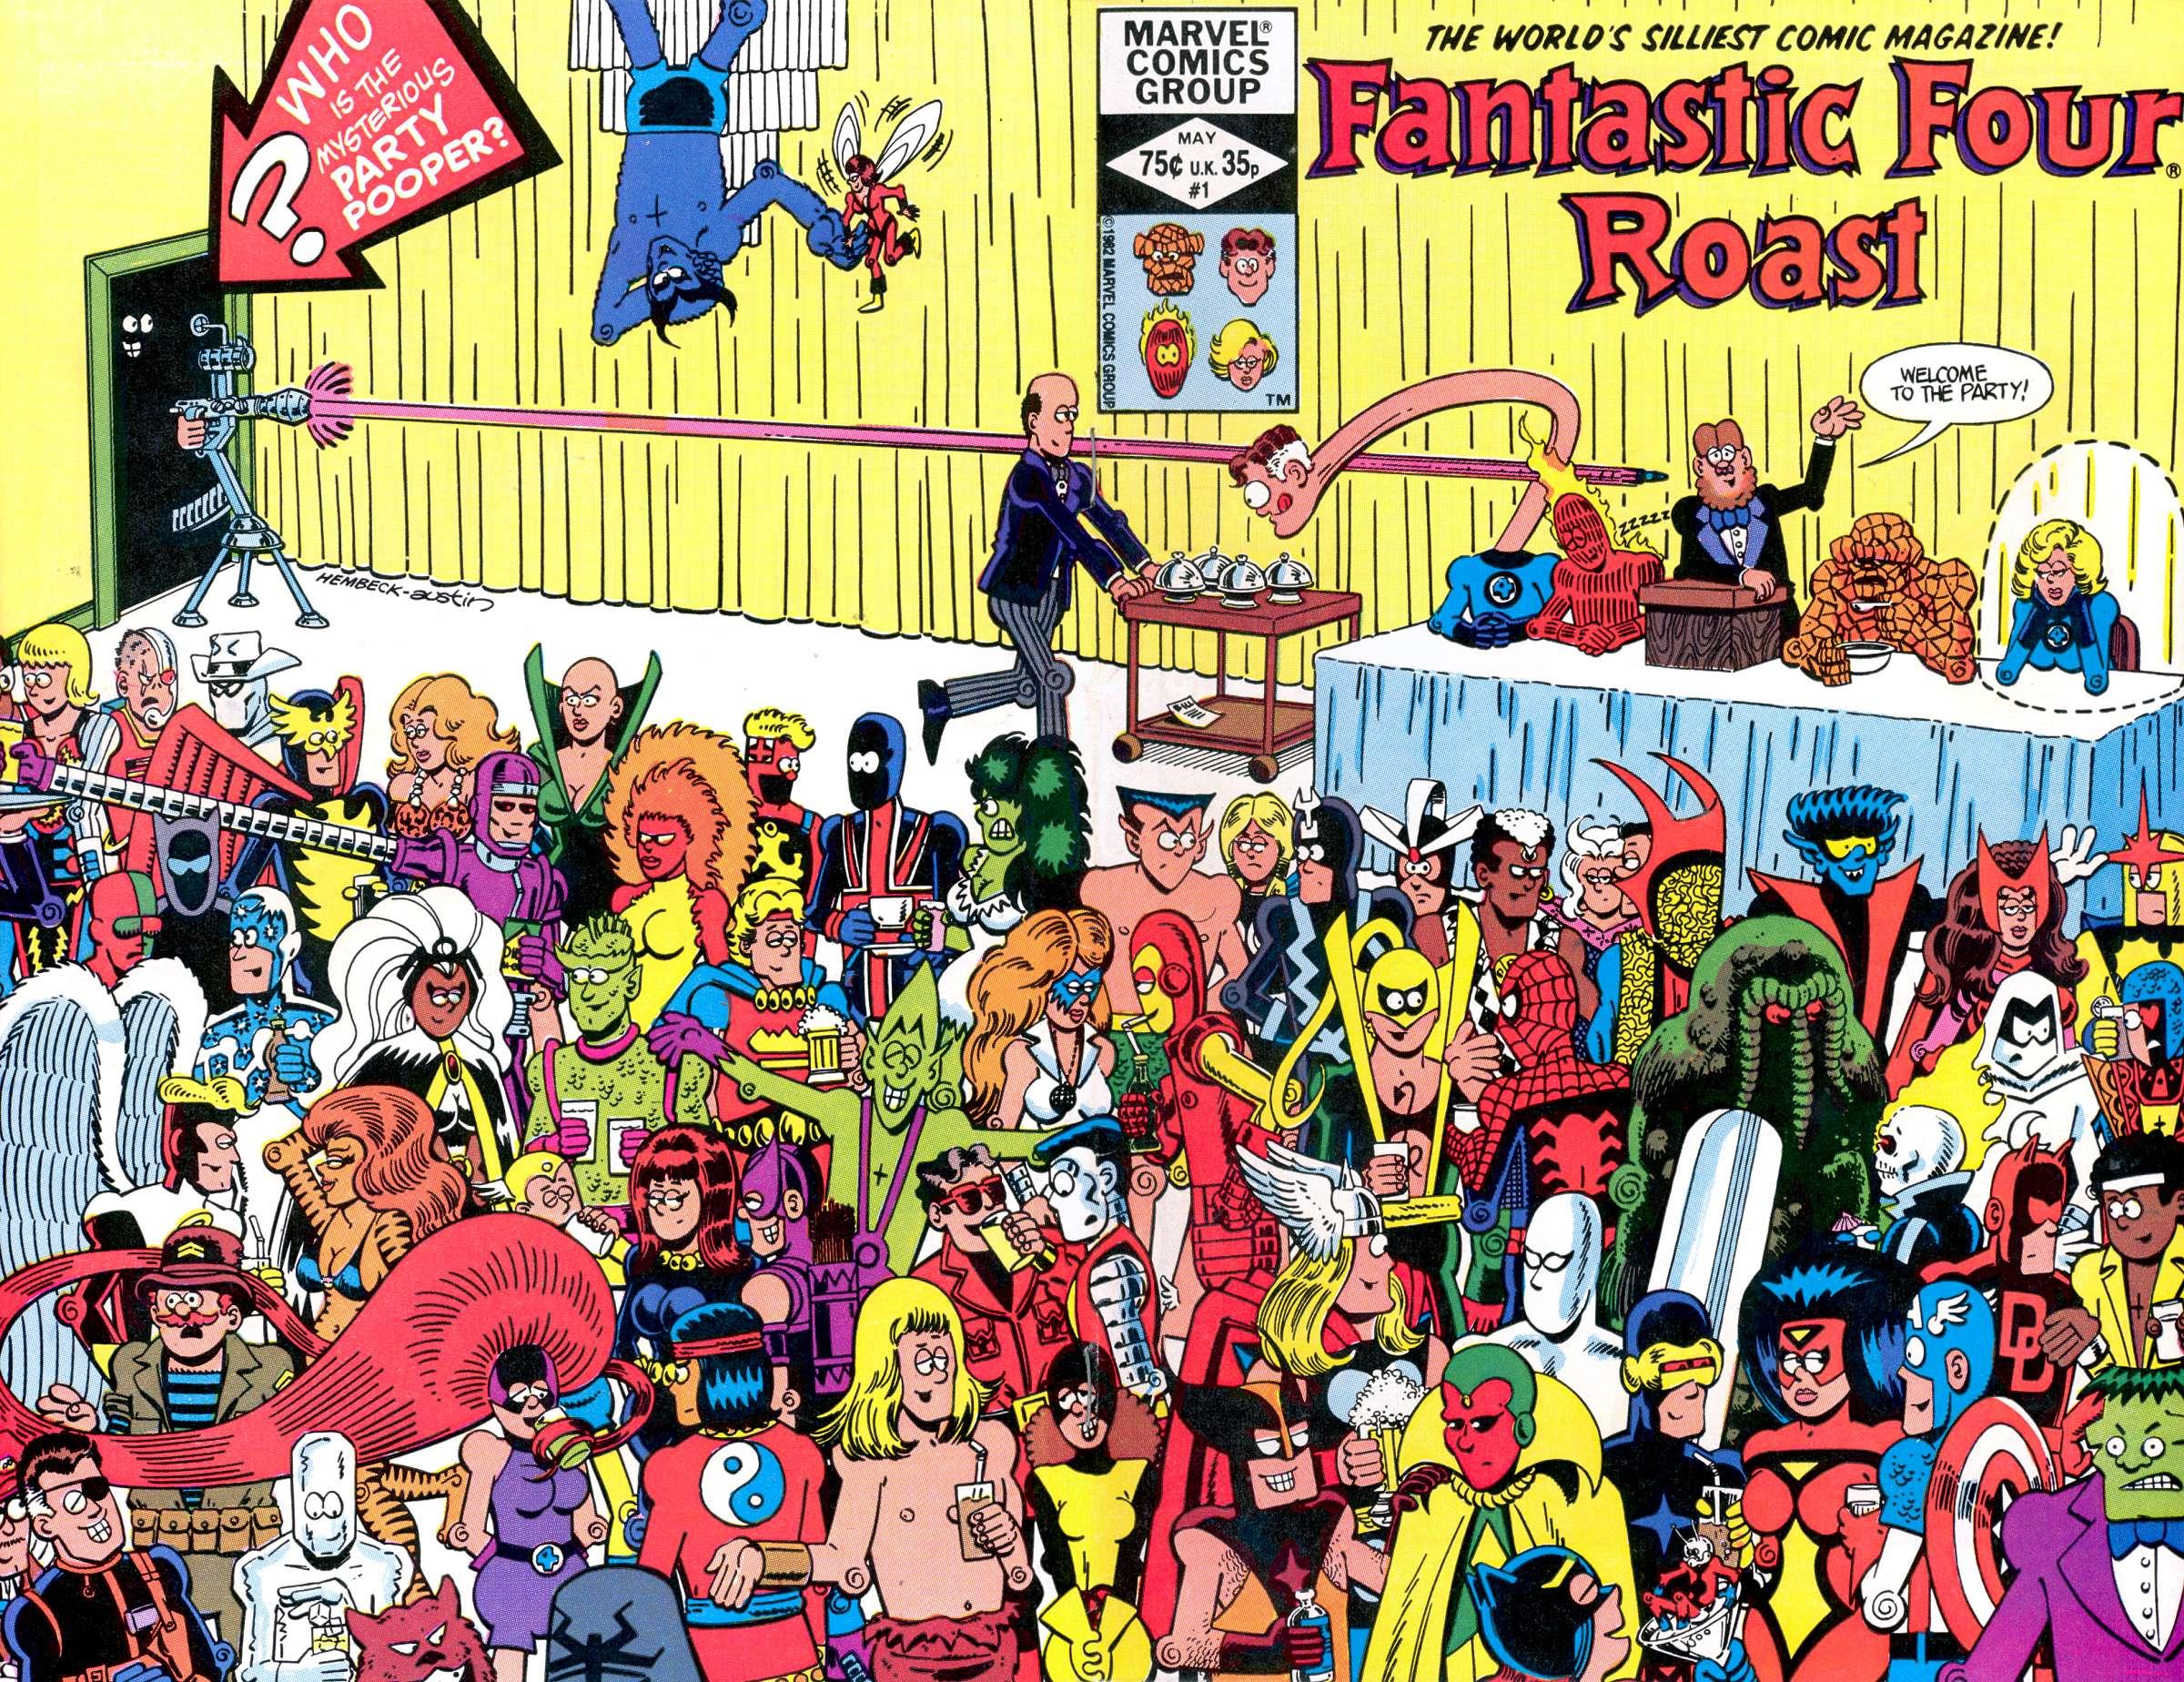 Fantastic Four Roast Full Page 1